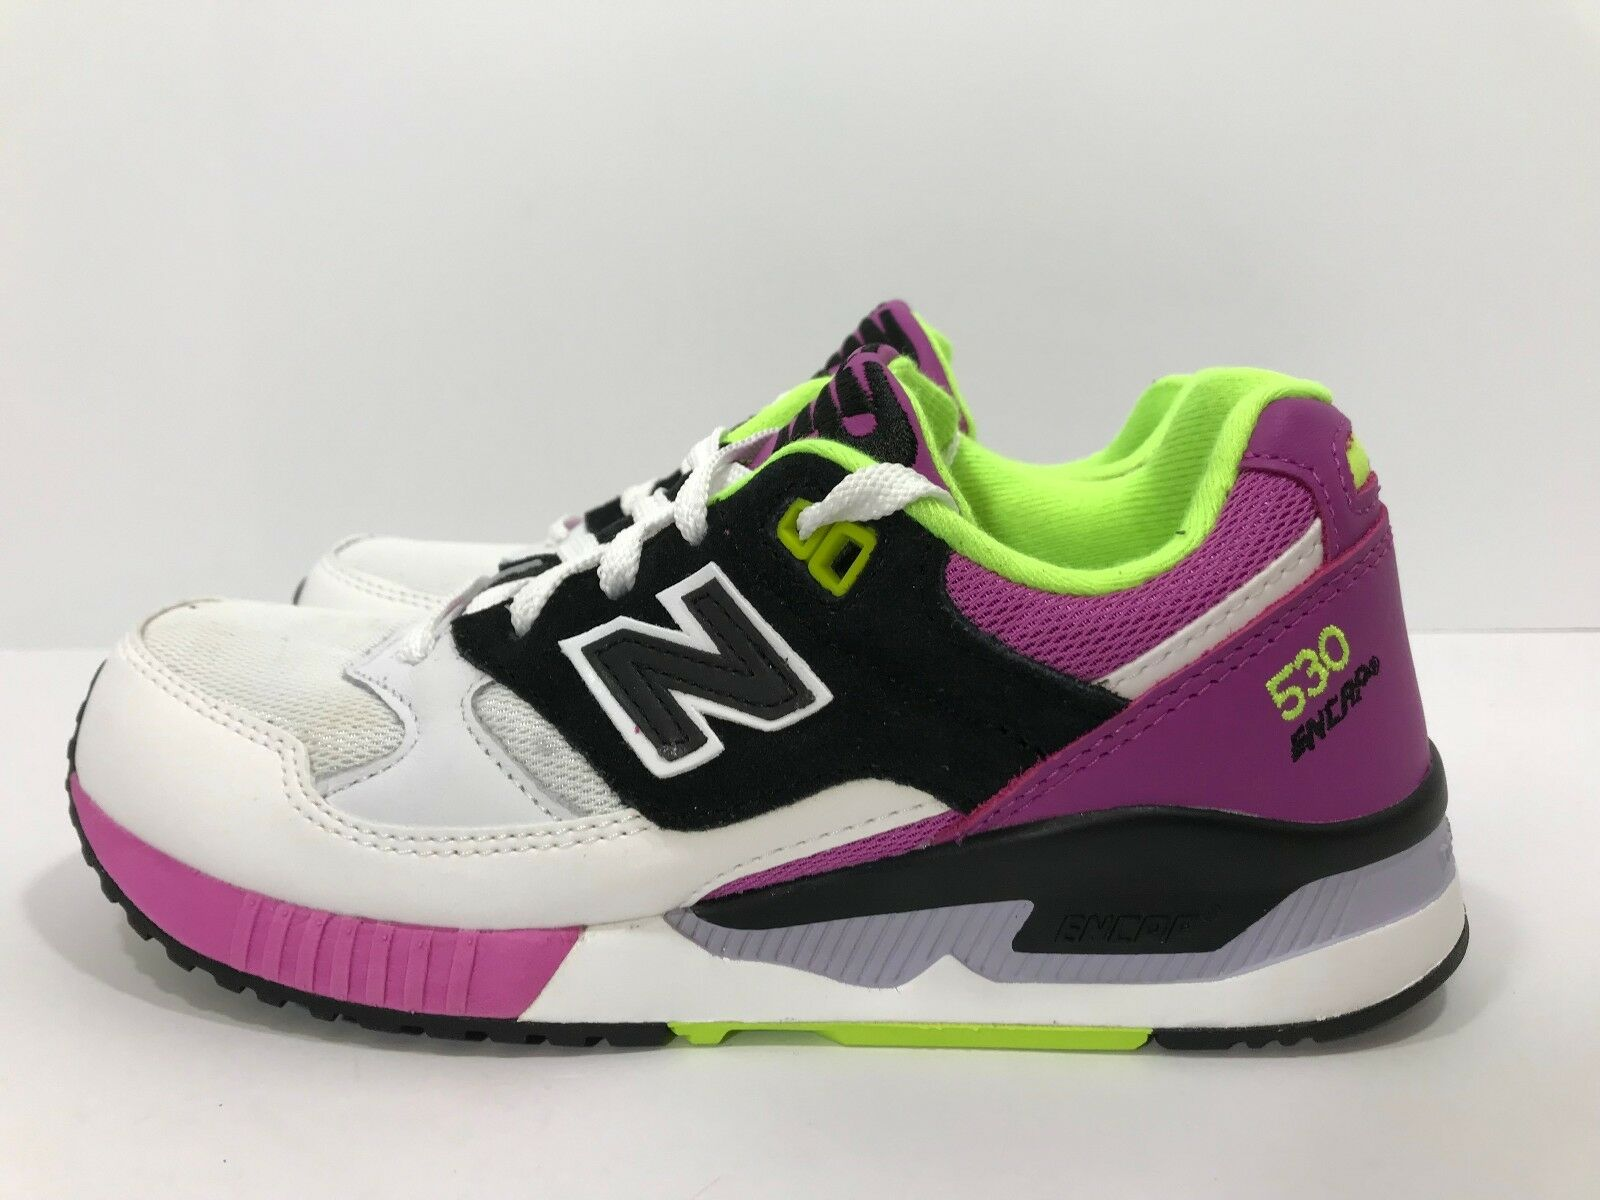 New New New Balance Retro 530 90's Bold Women's Size 5.5 Running shoes W530BOB NEW d41860